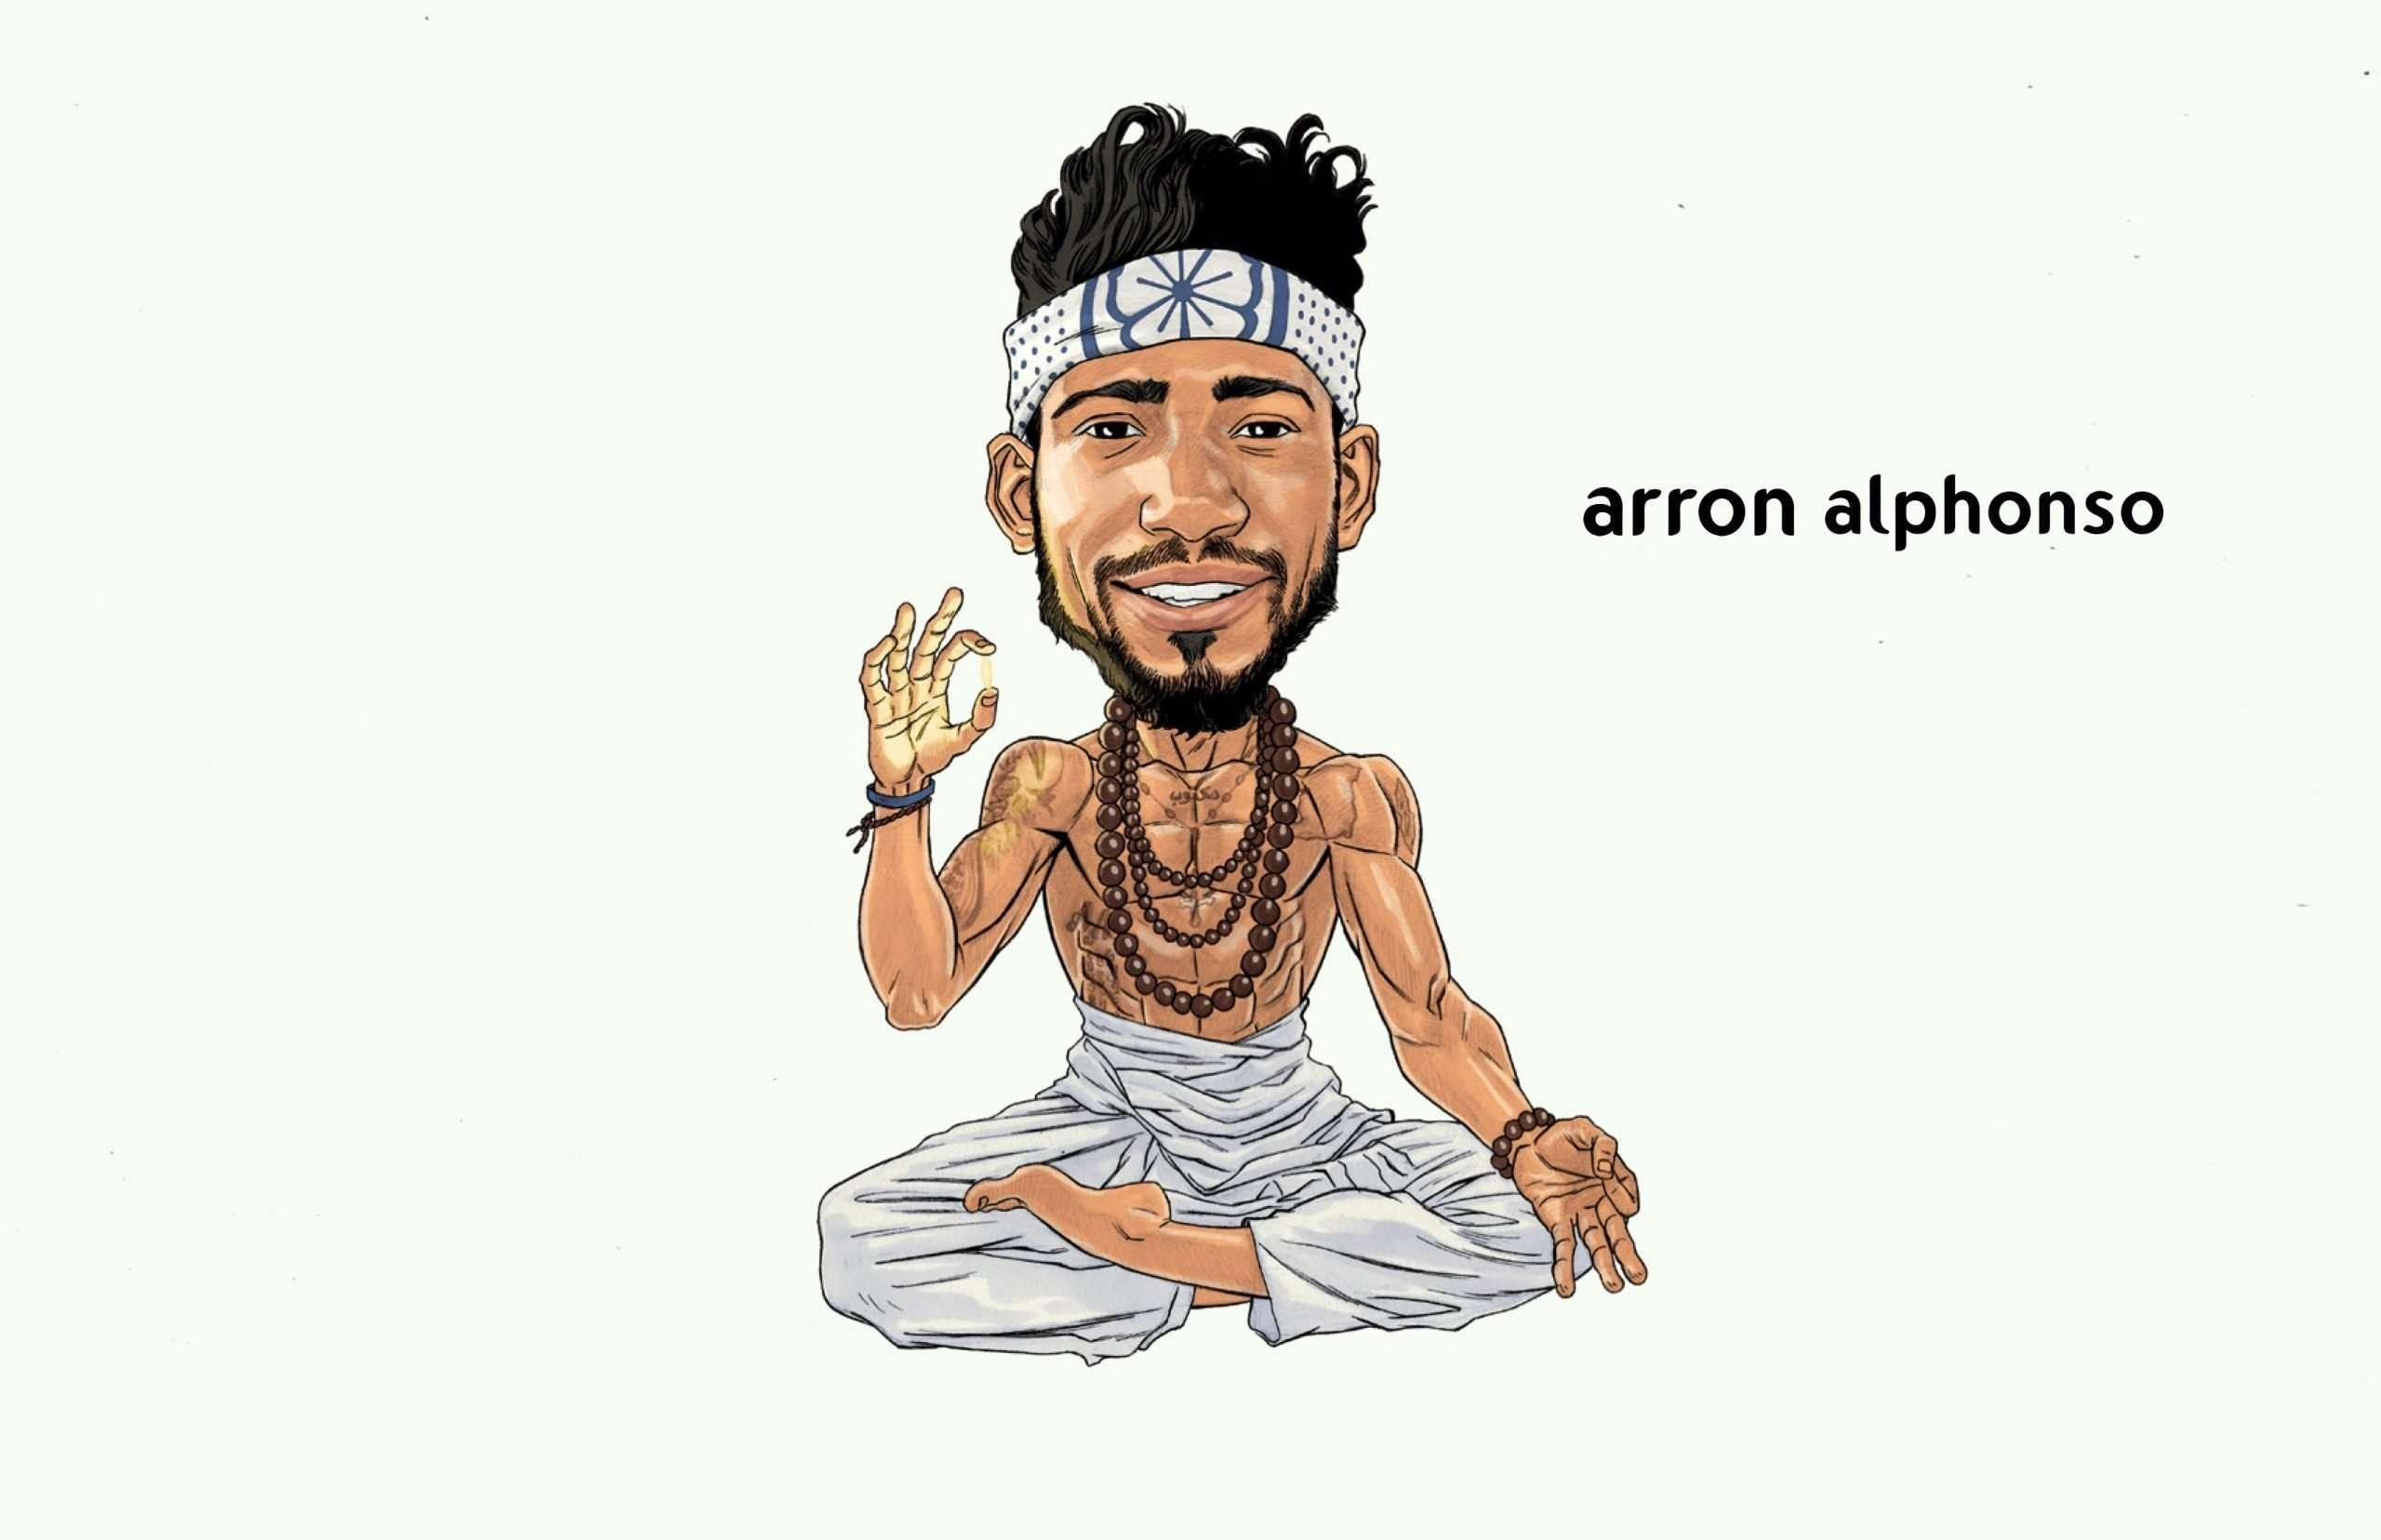 Arron Alphonso